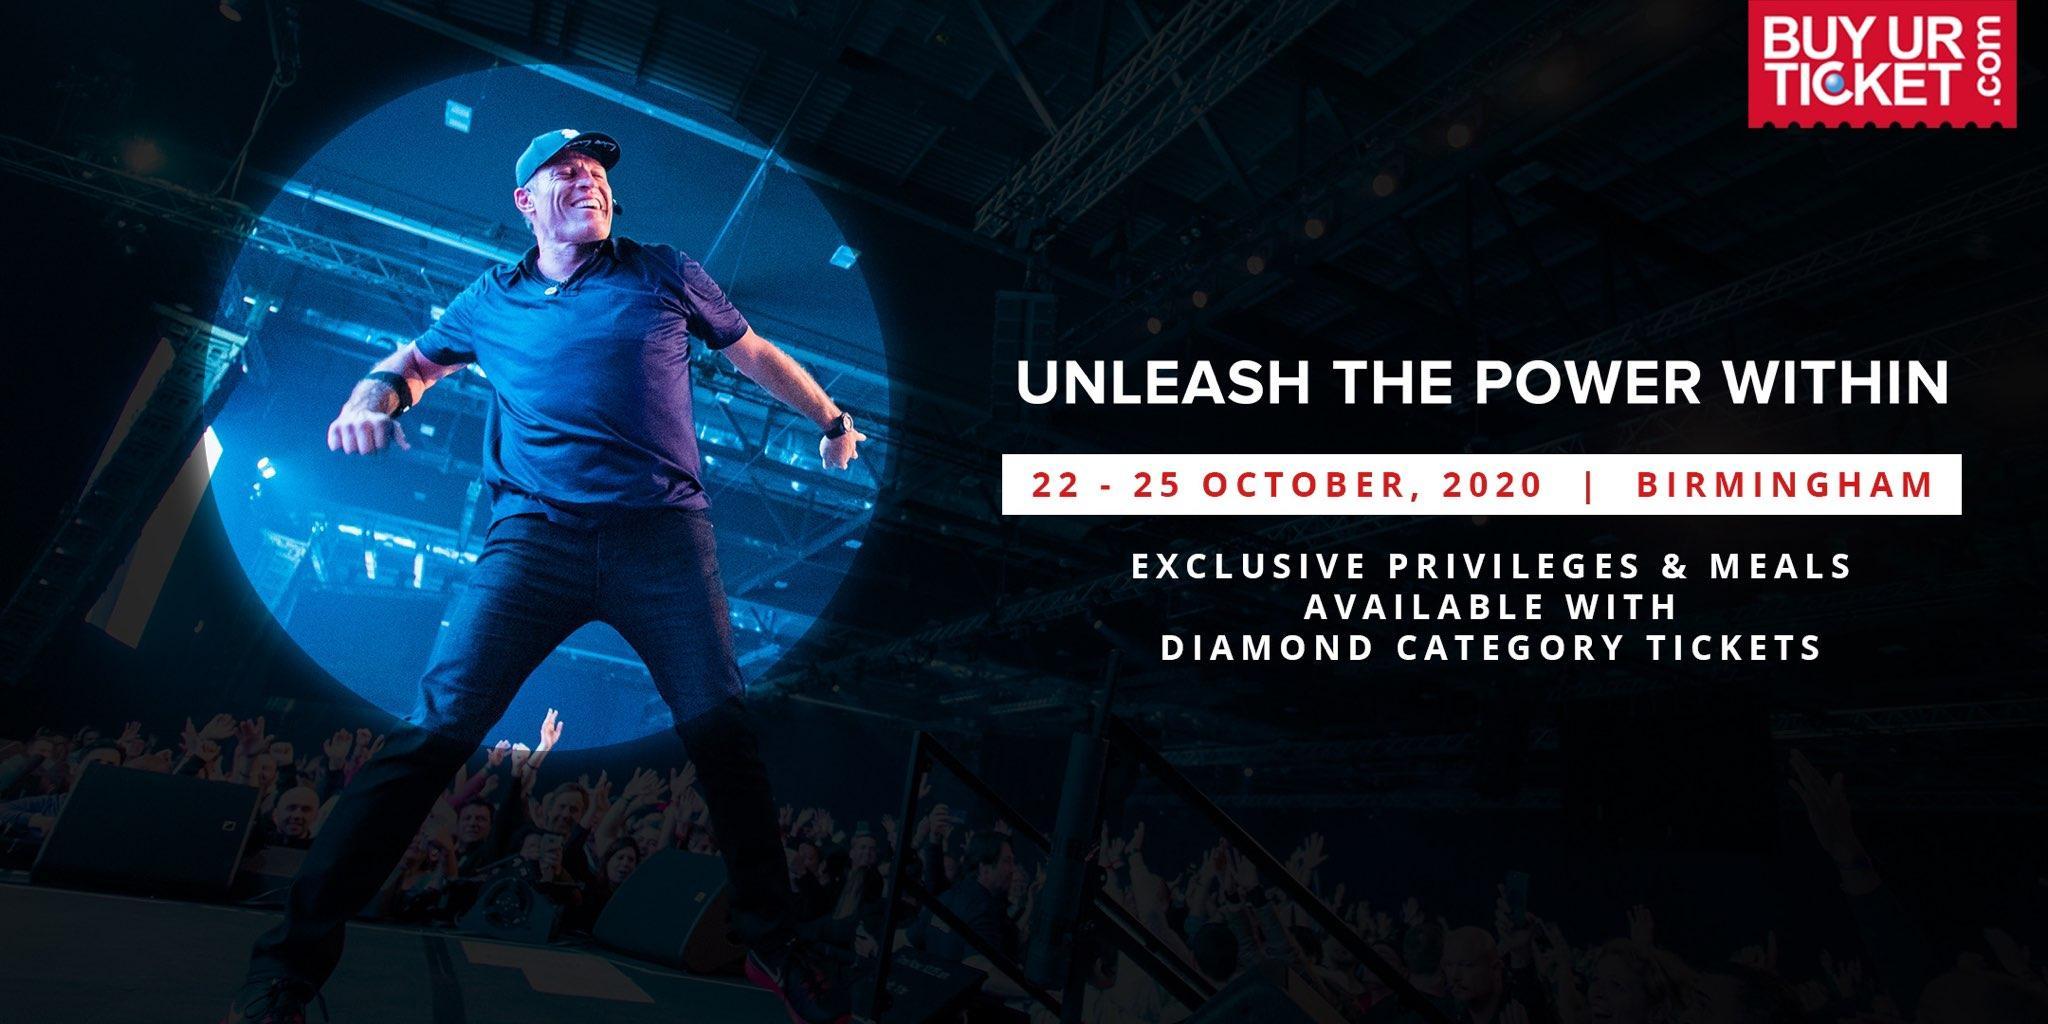 Tony Robbins UPW Birmingham | Diamond Ticket & Get Premium Experience